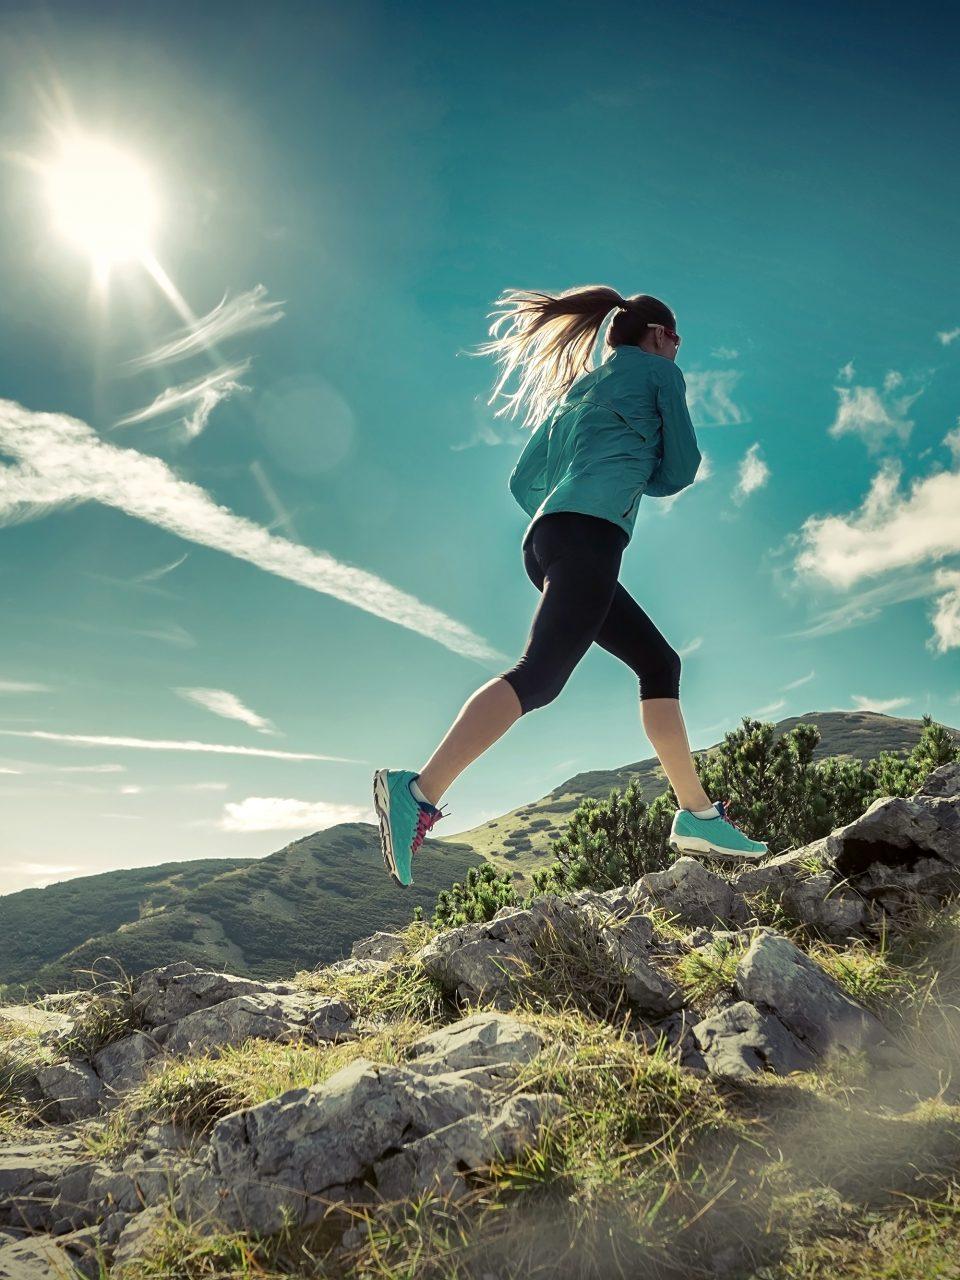 Fotocredit: Shutterstock